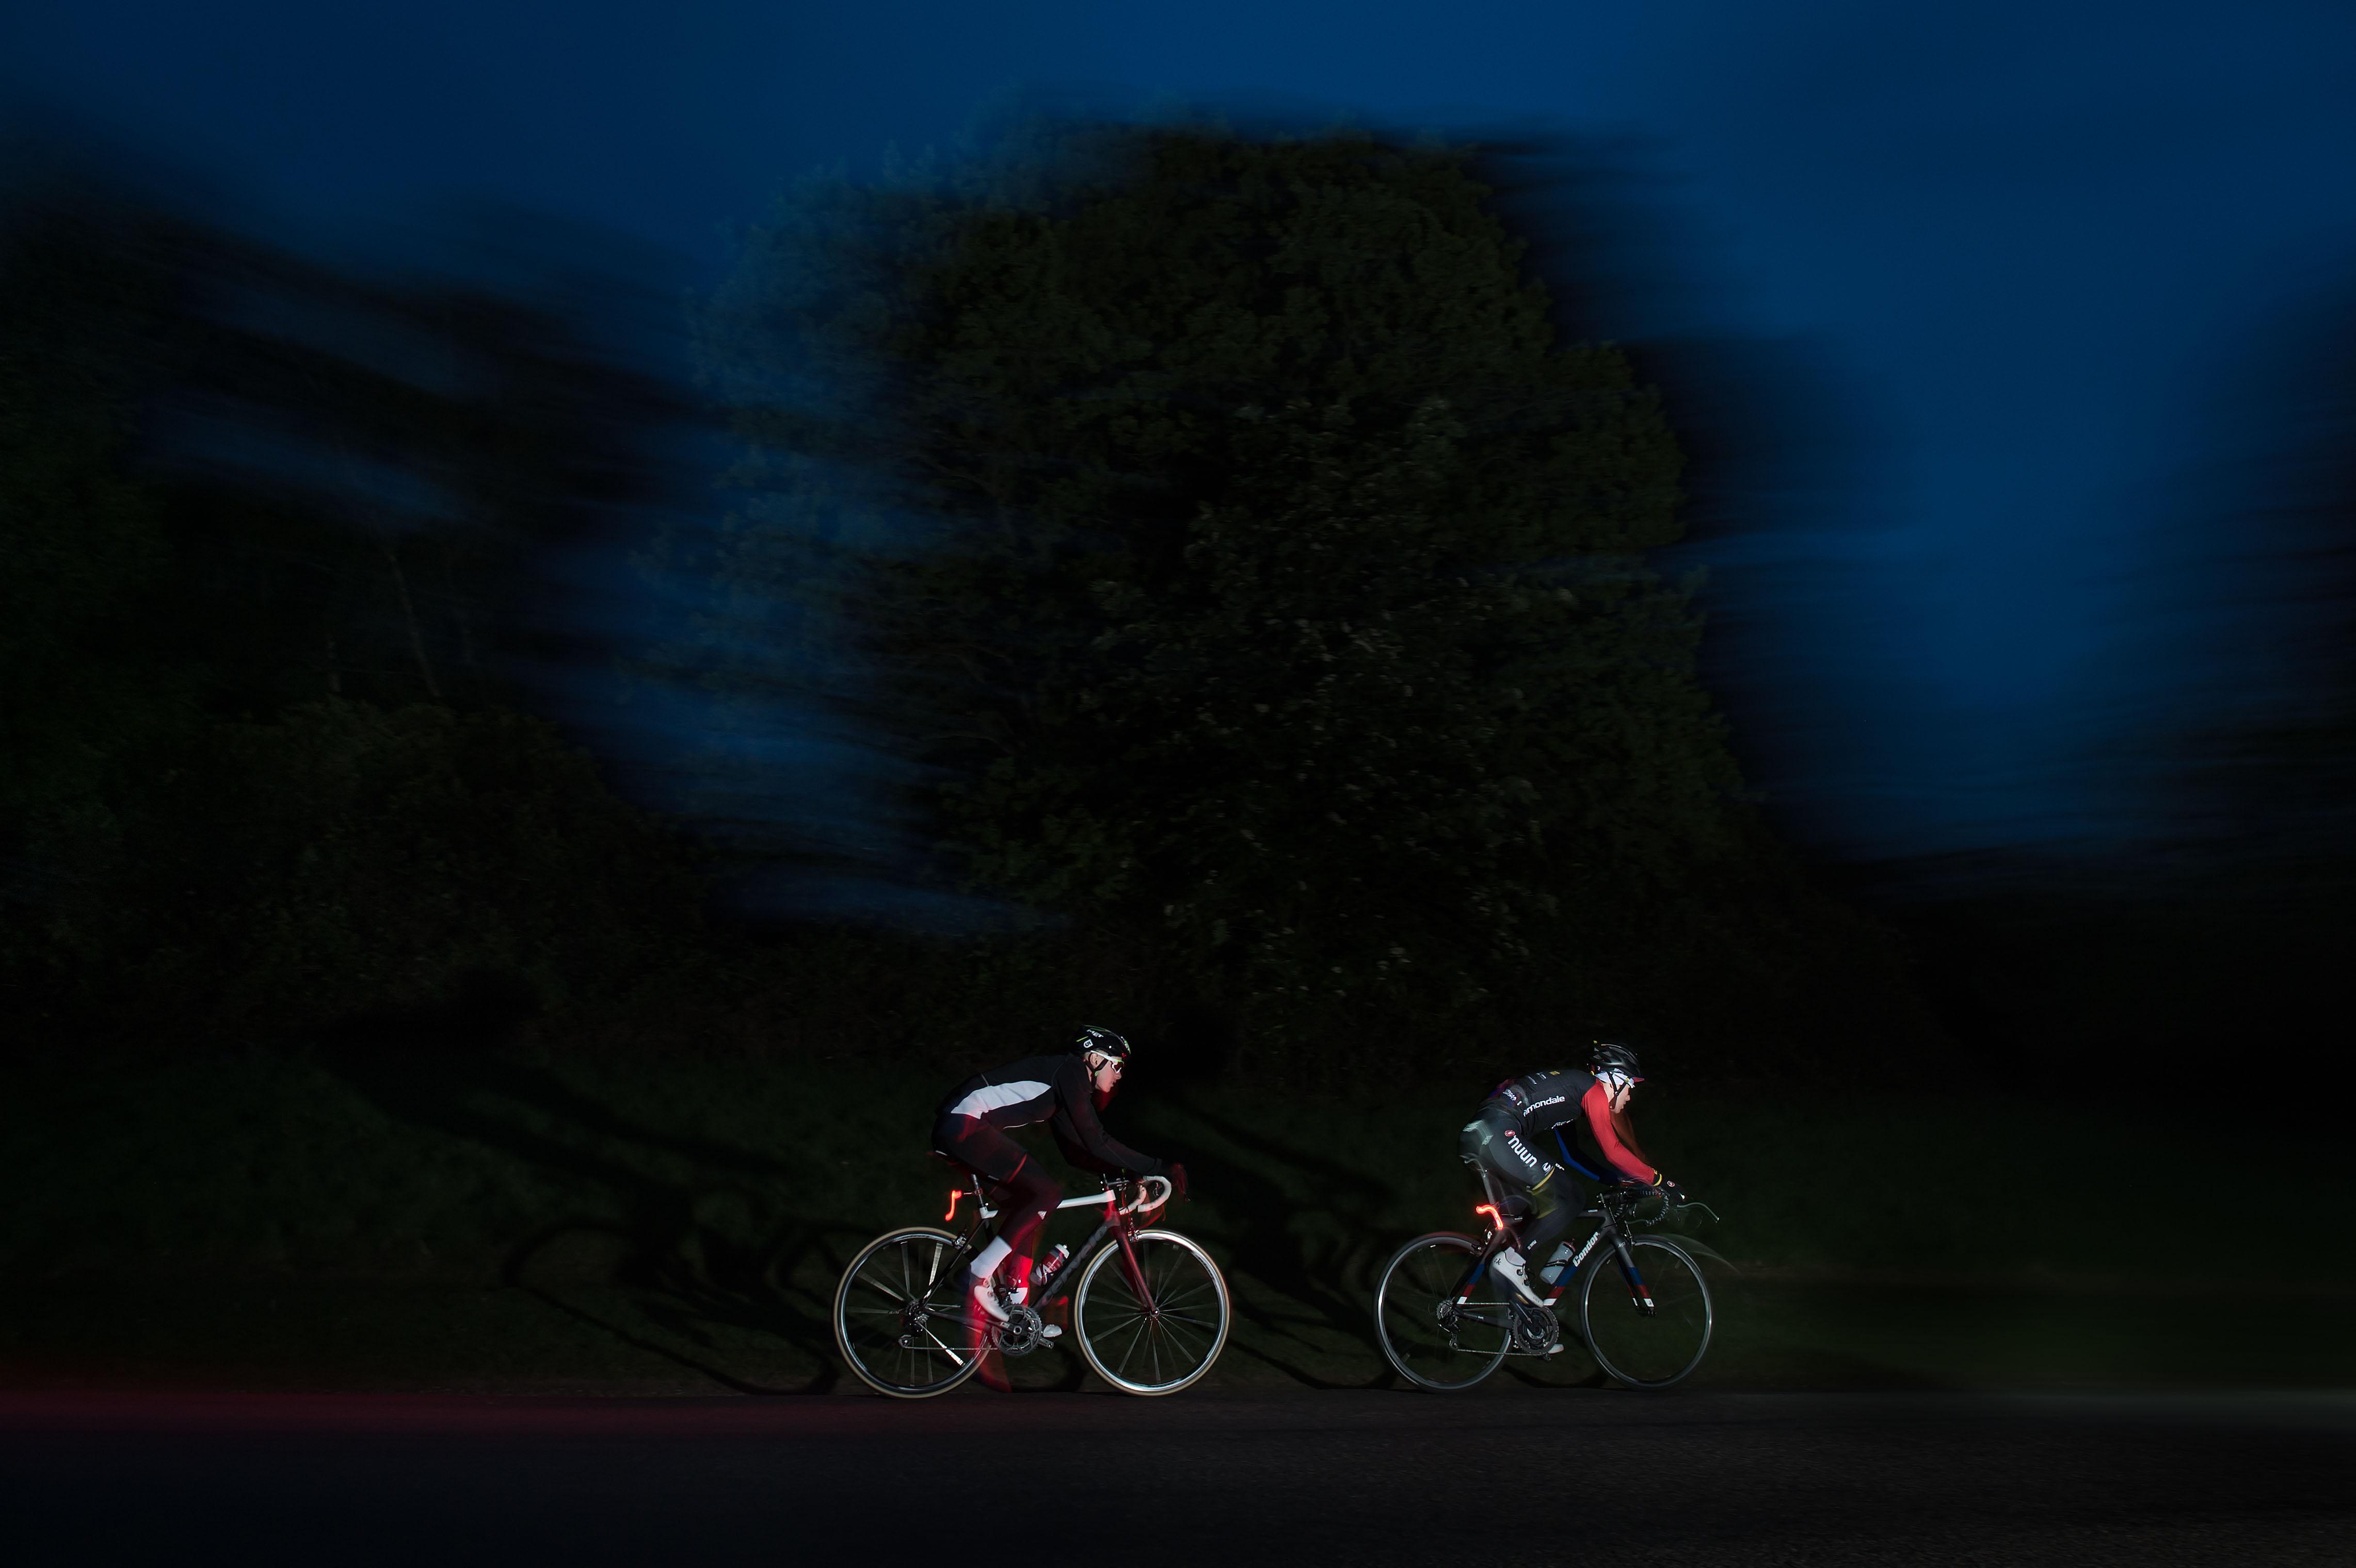 Red Bull TimeLaps riders in the dark